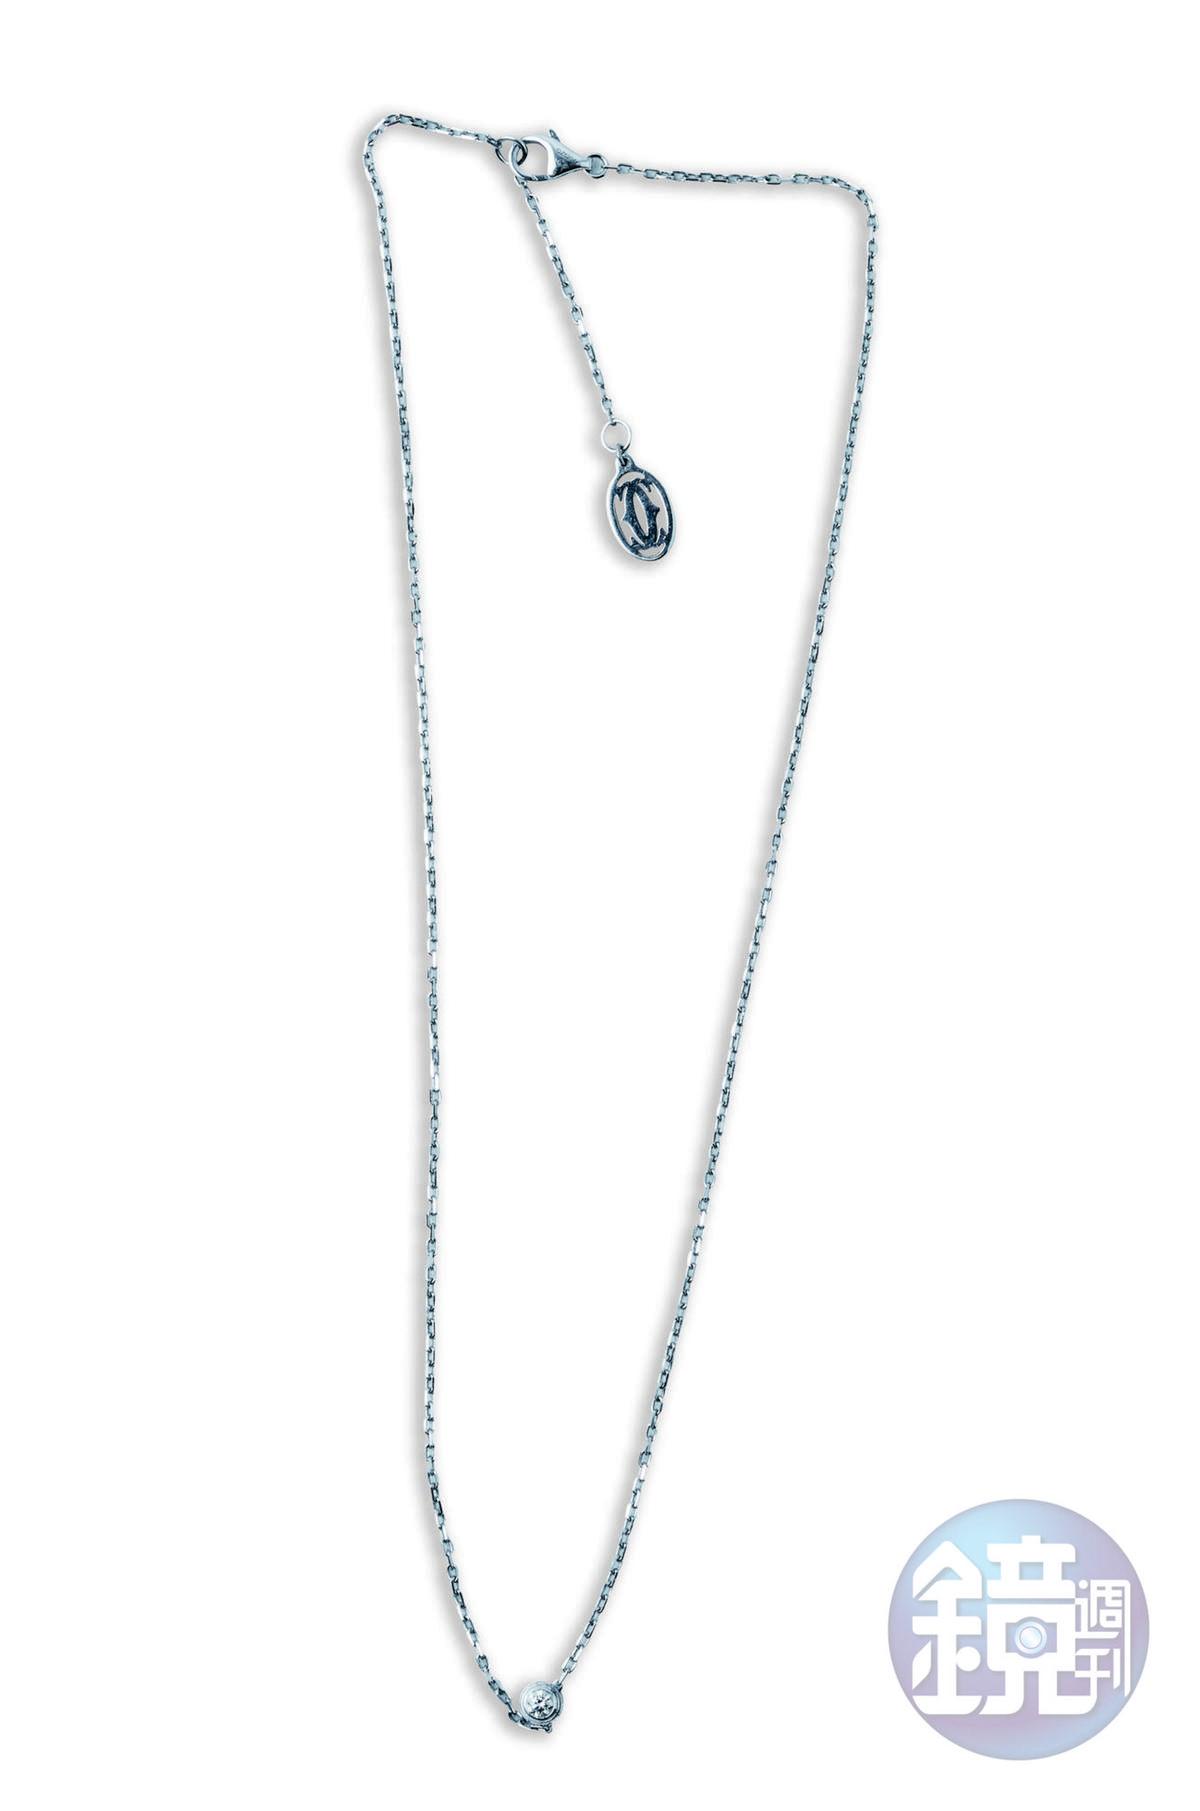 Cartier鑽石項鍊,老公送的禮物。